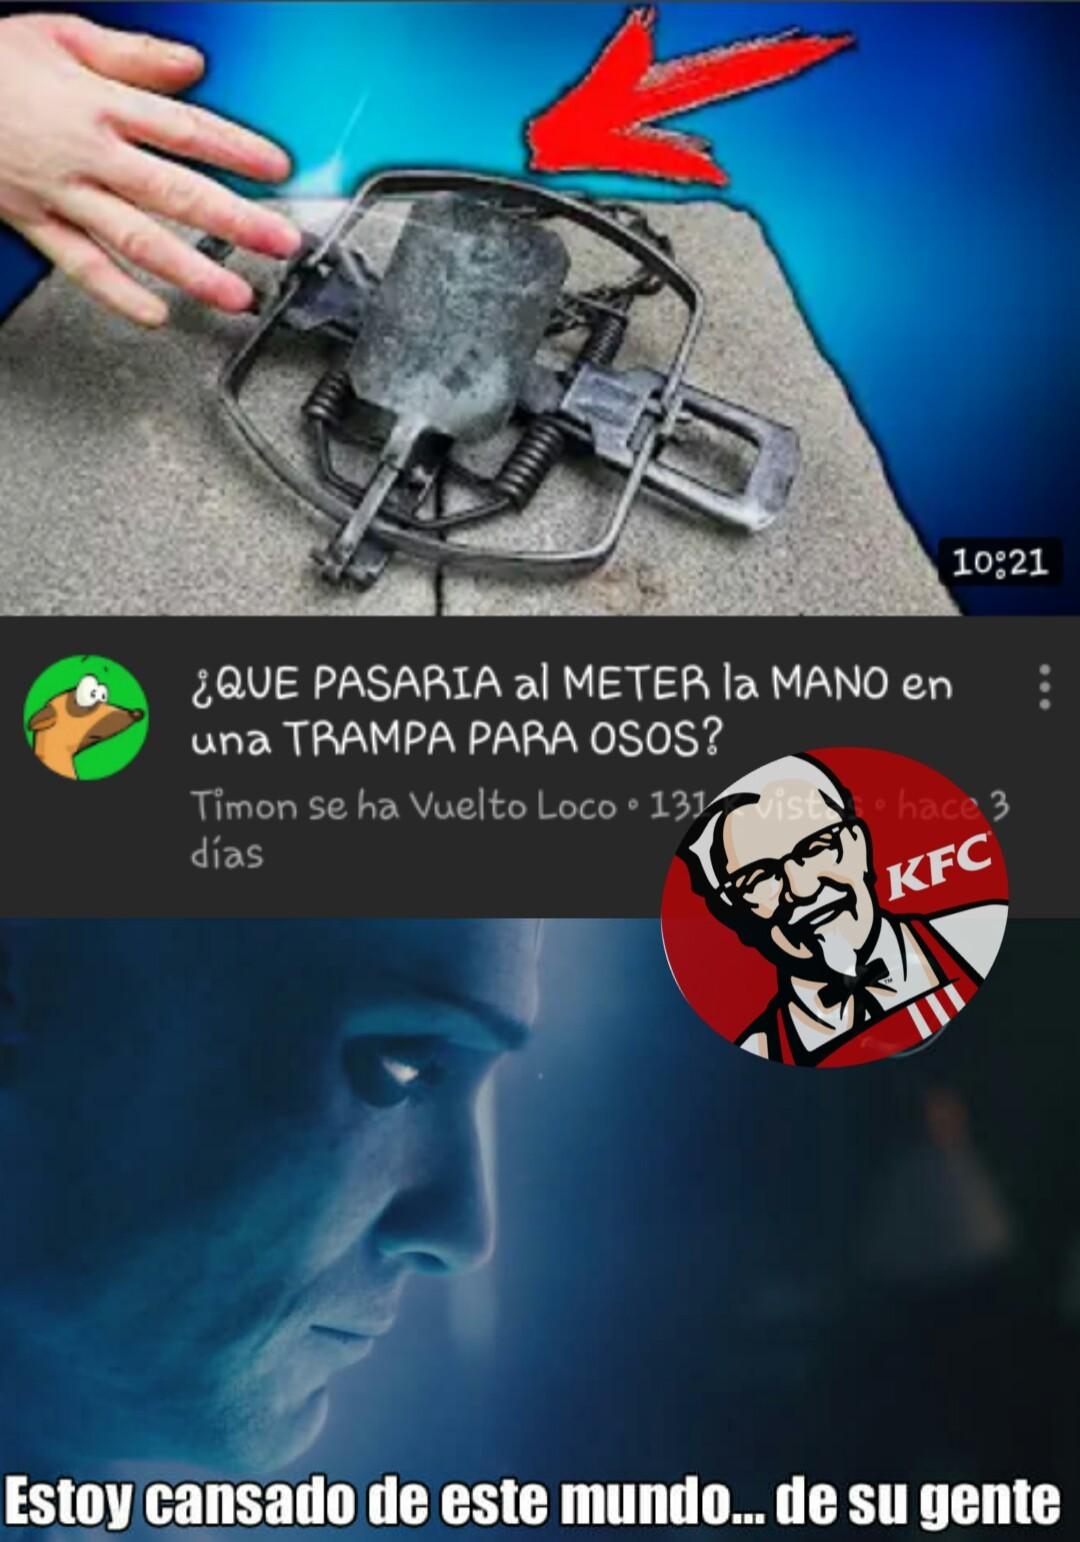 En serio ese video es real - meme